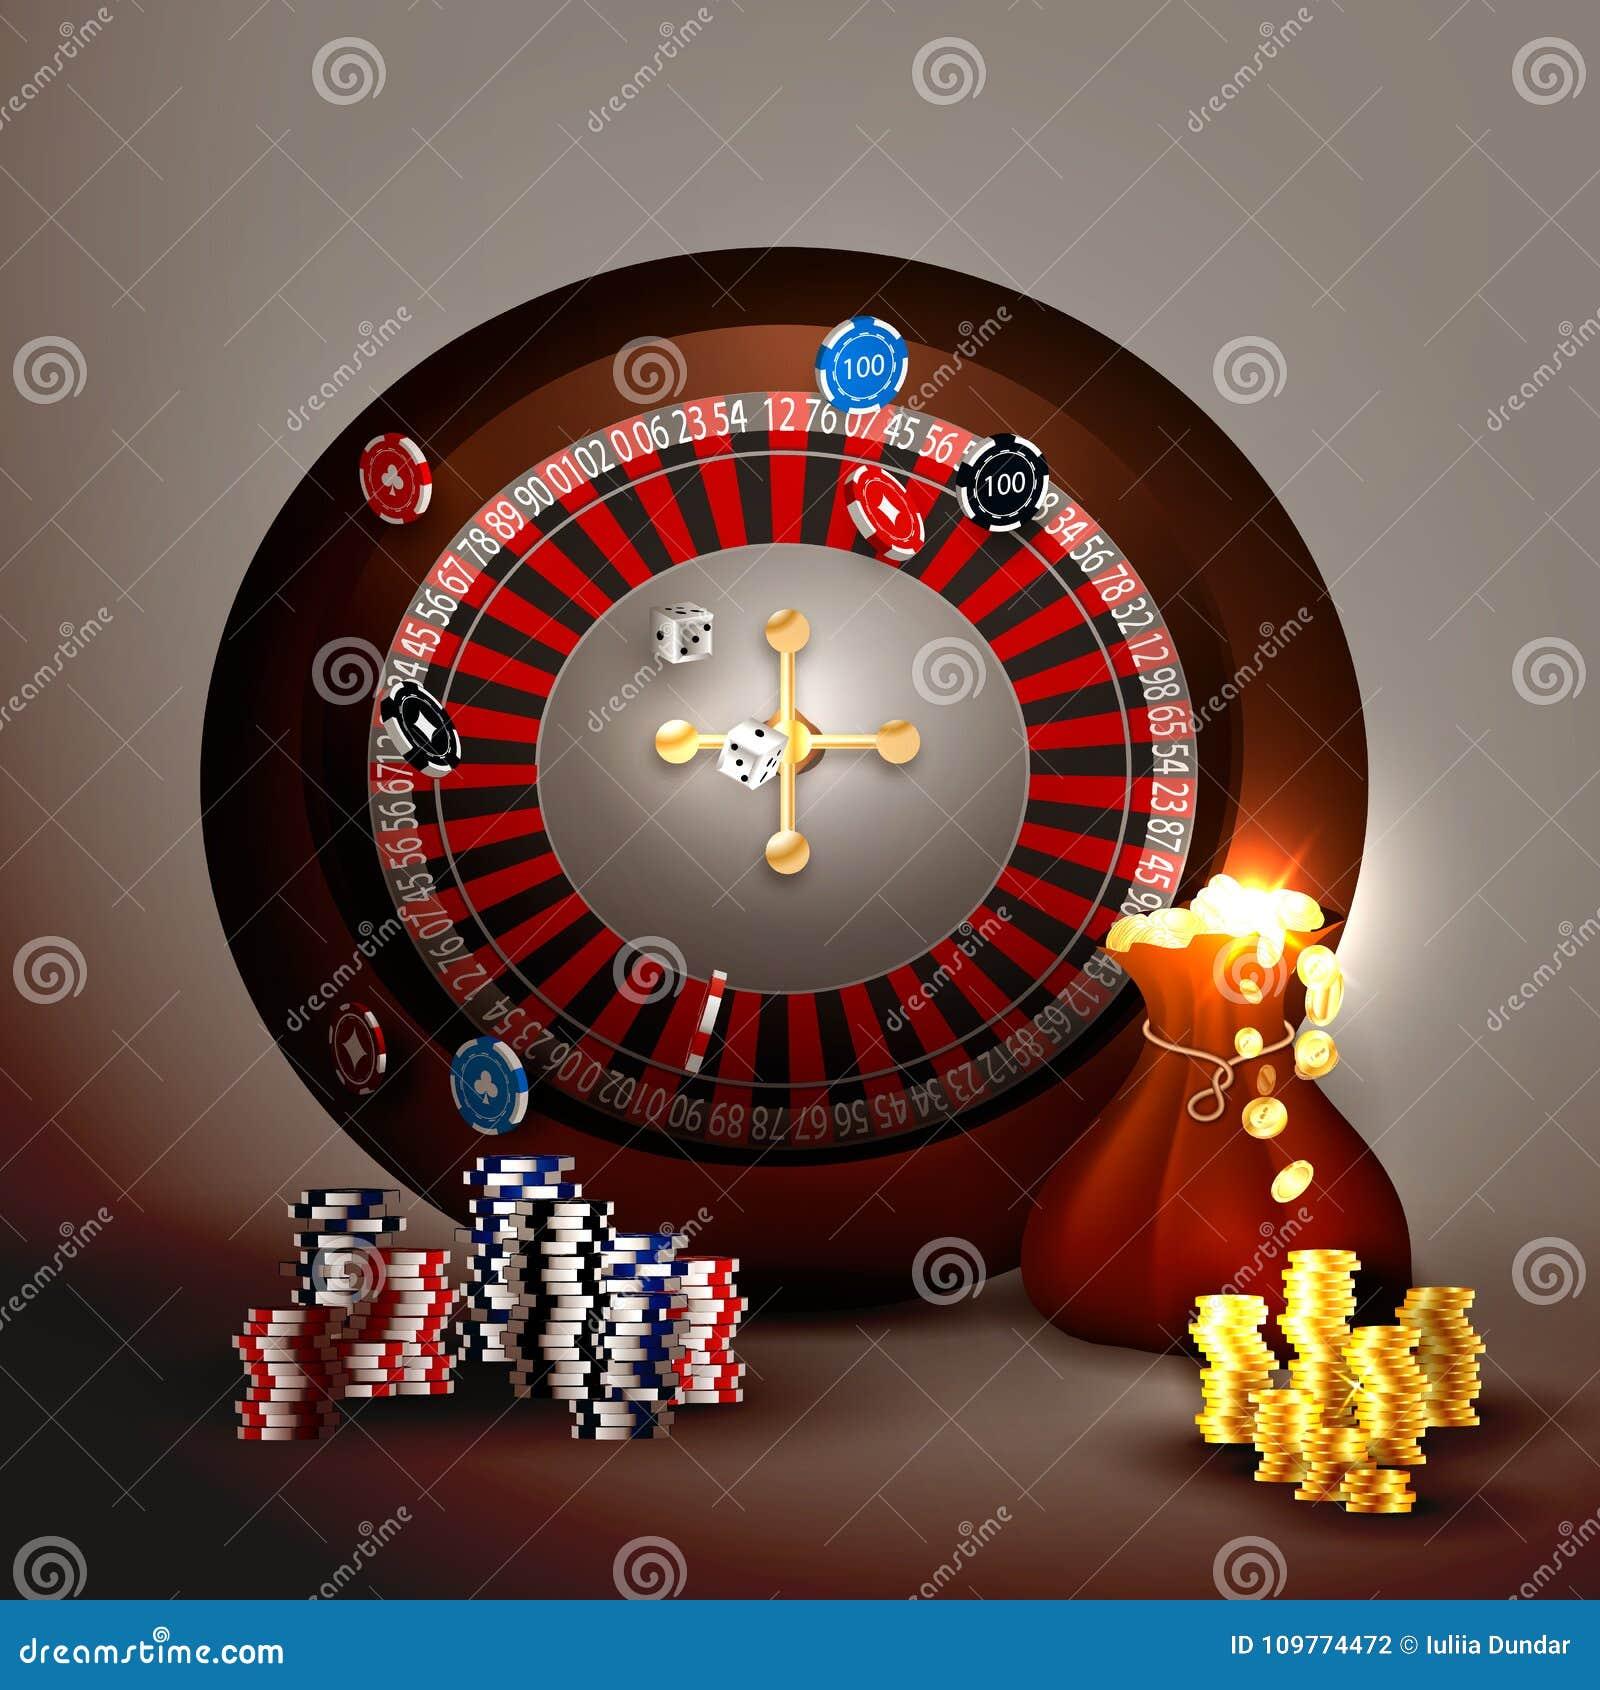 Casino Slot Machine Stock Vector Illustration Of Gamble 109774472